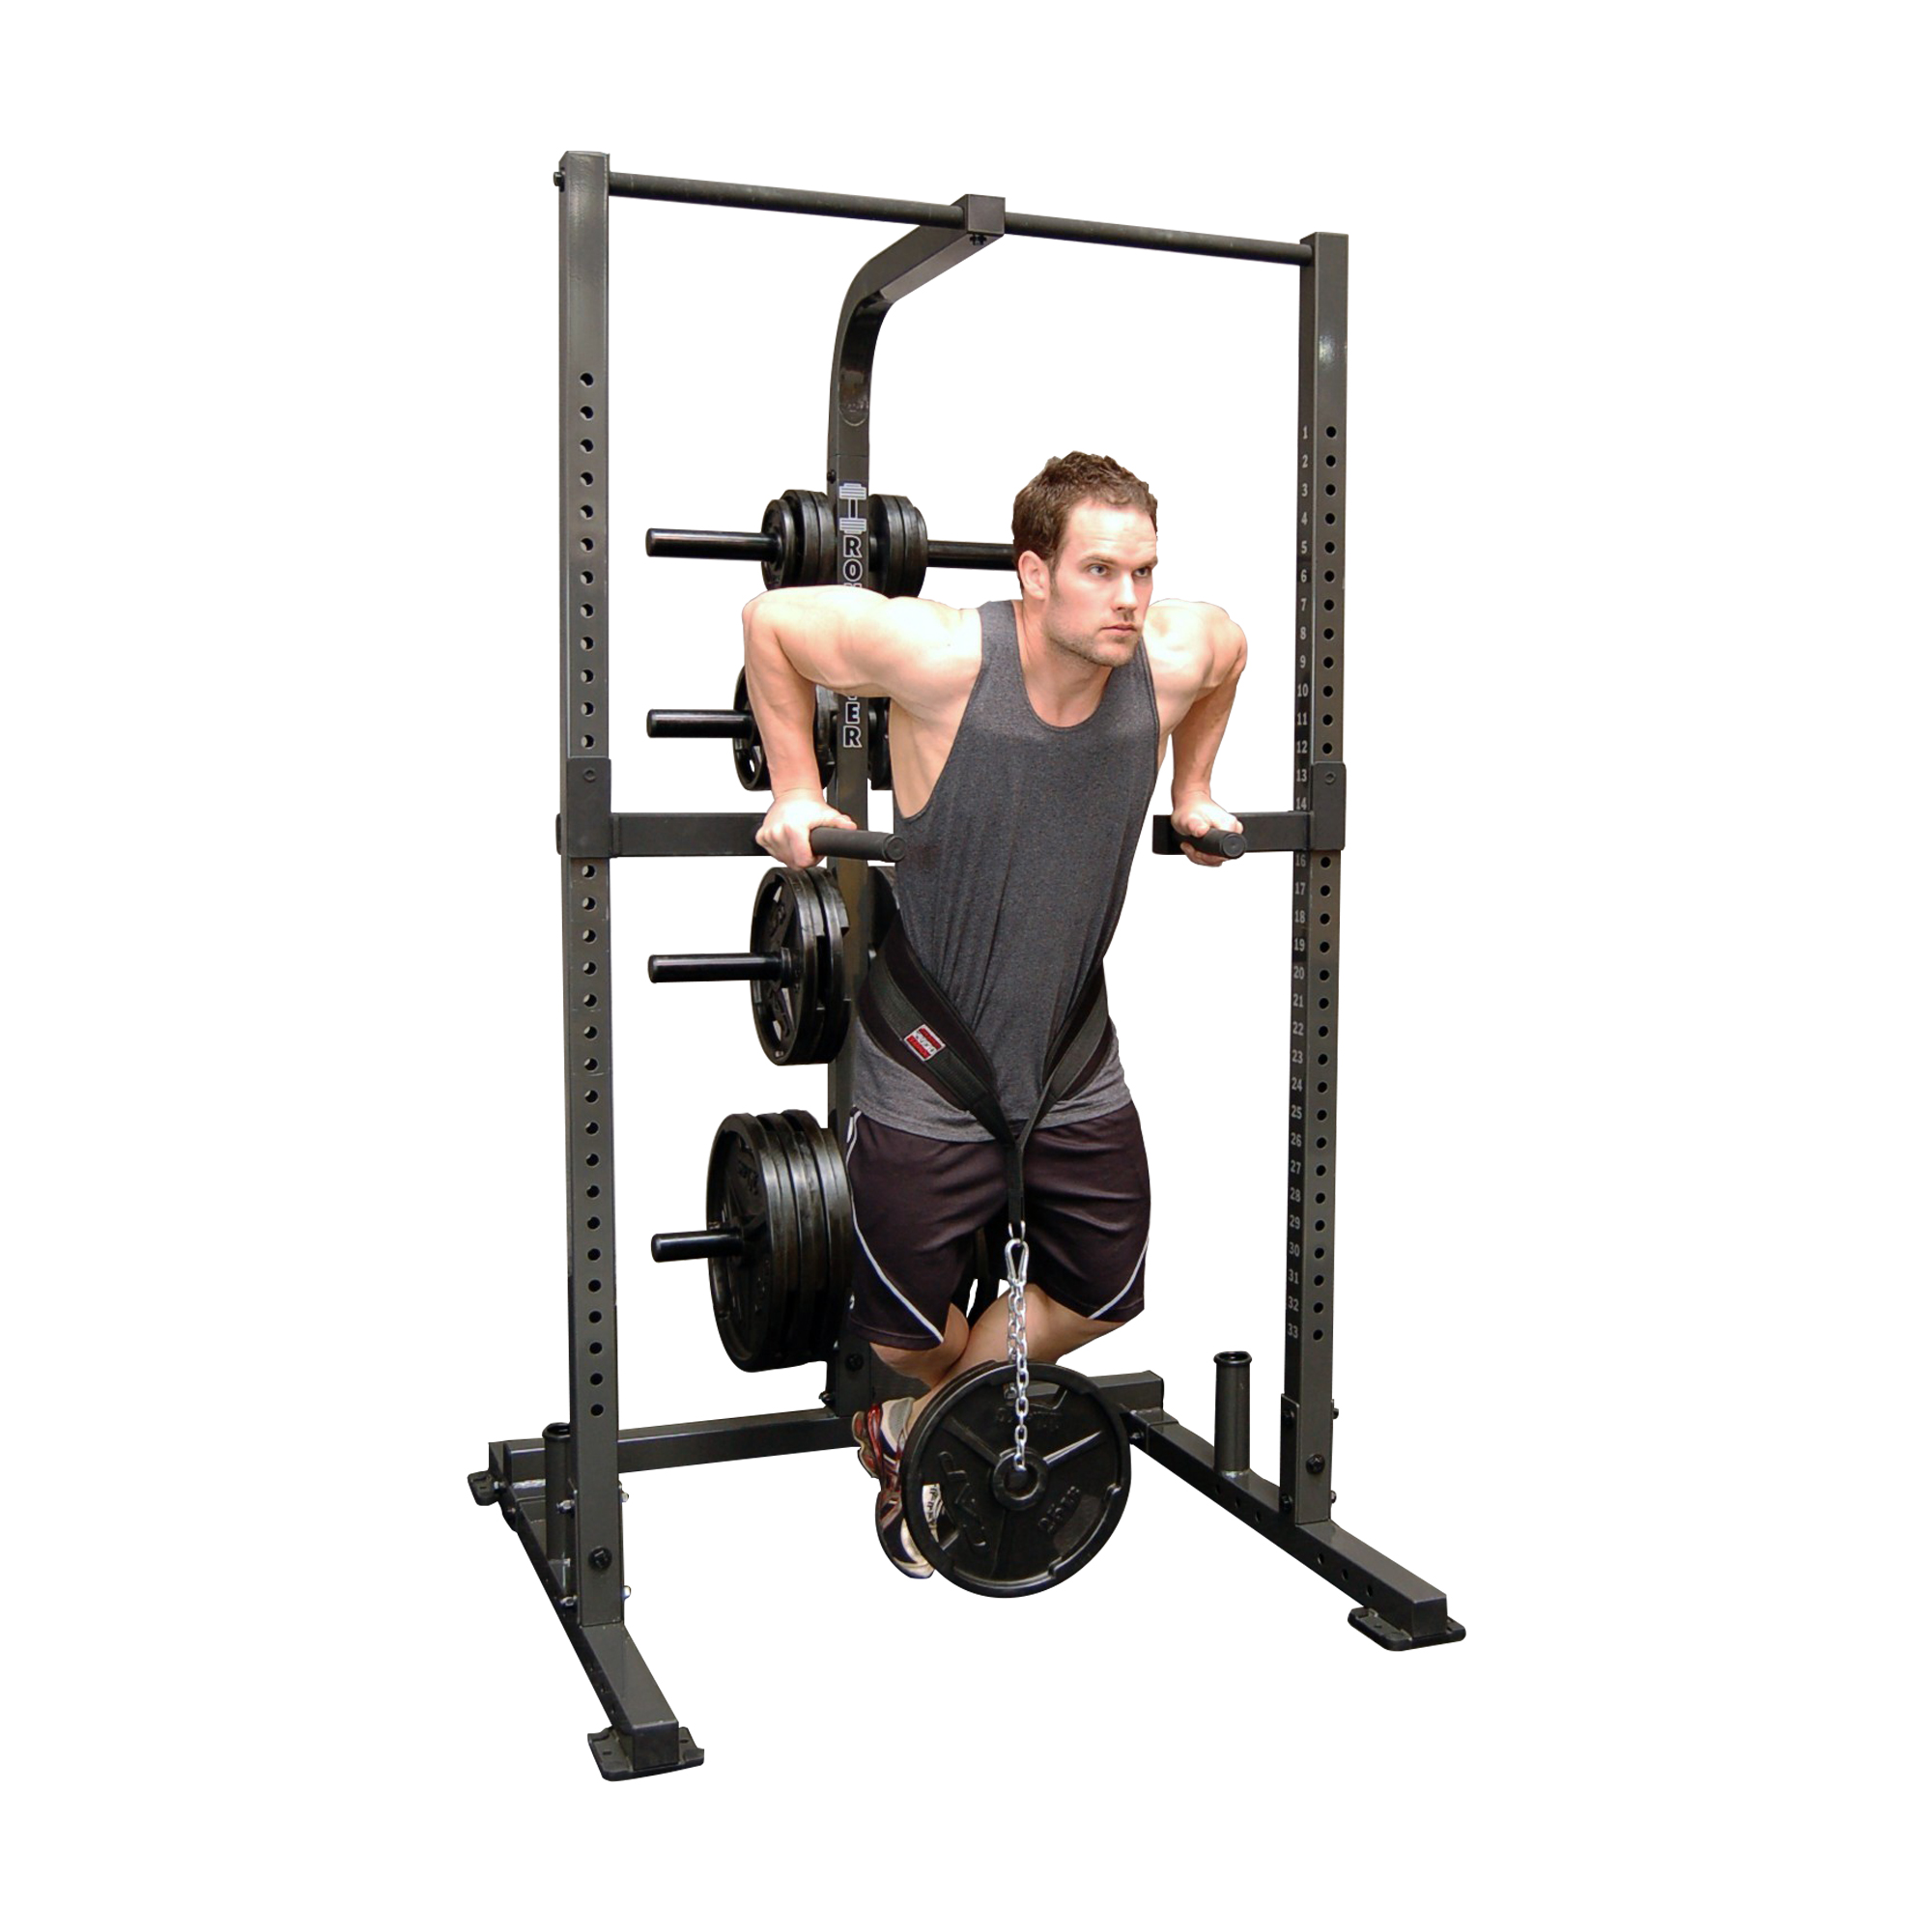 IronmasterUK IM1500 dips with additional weights